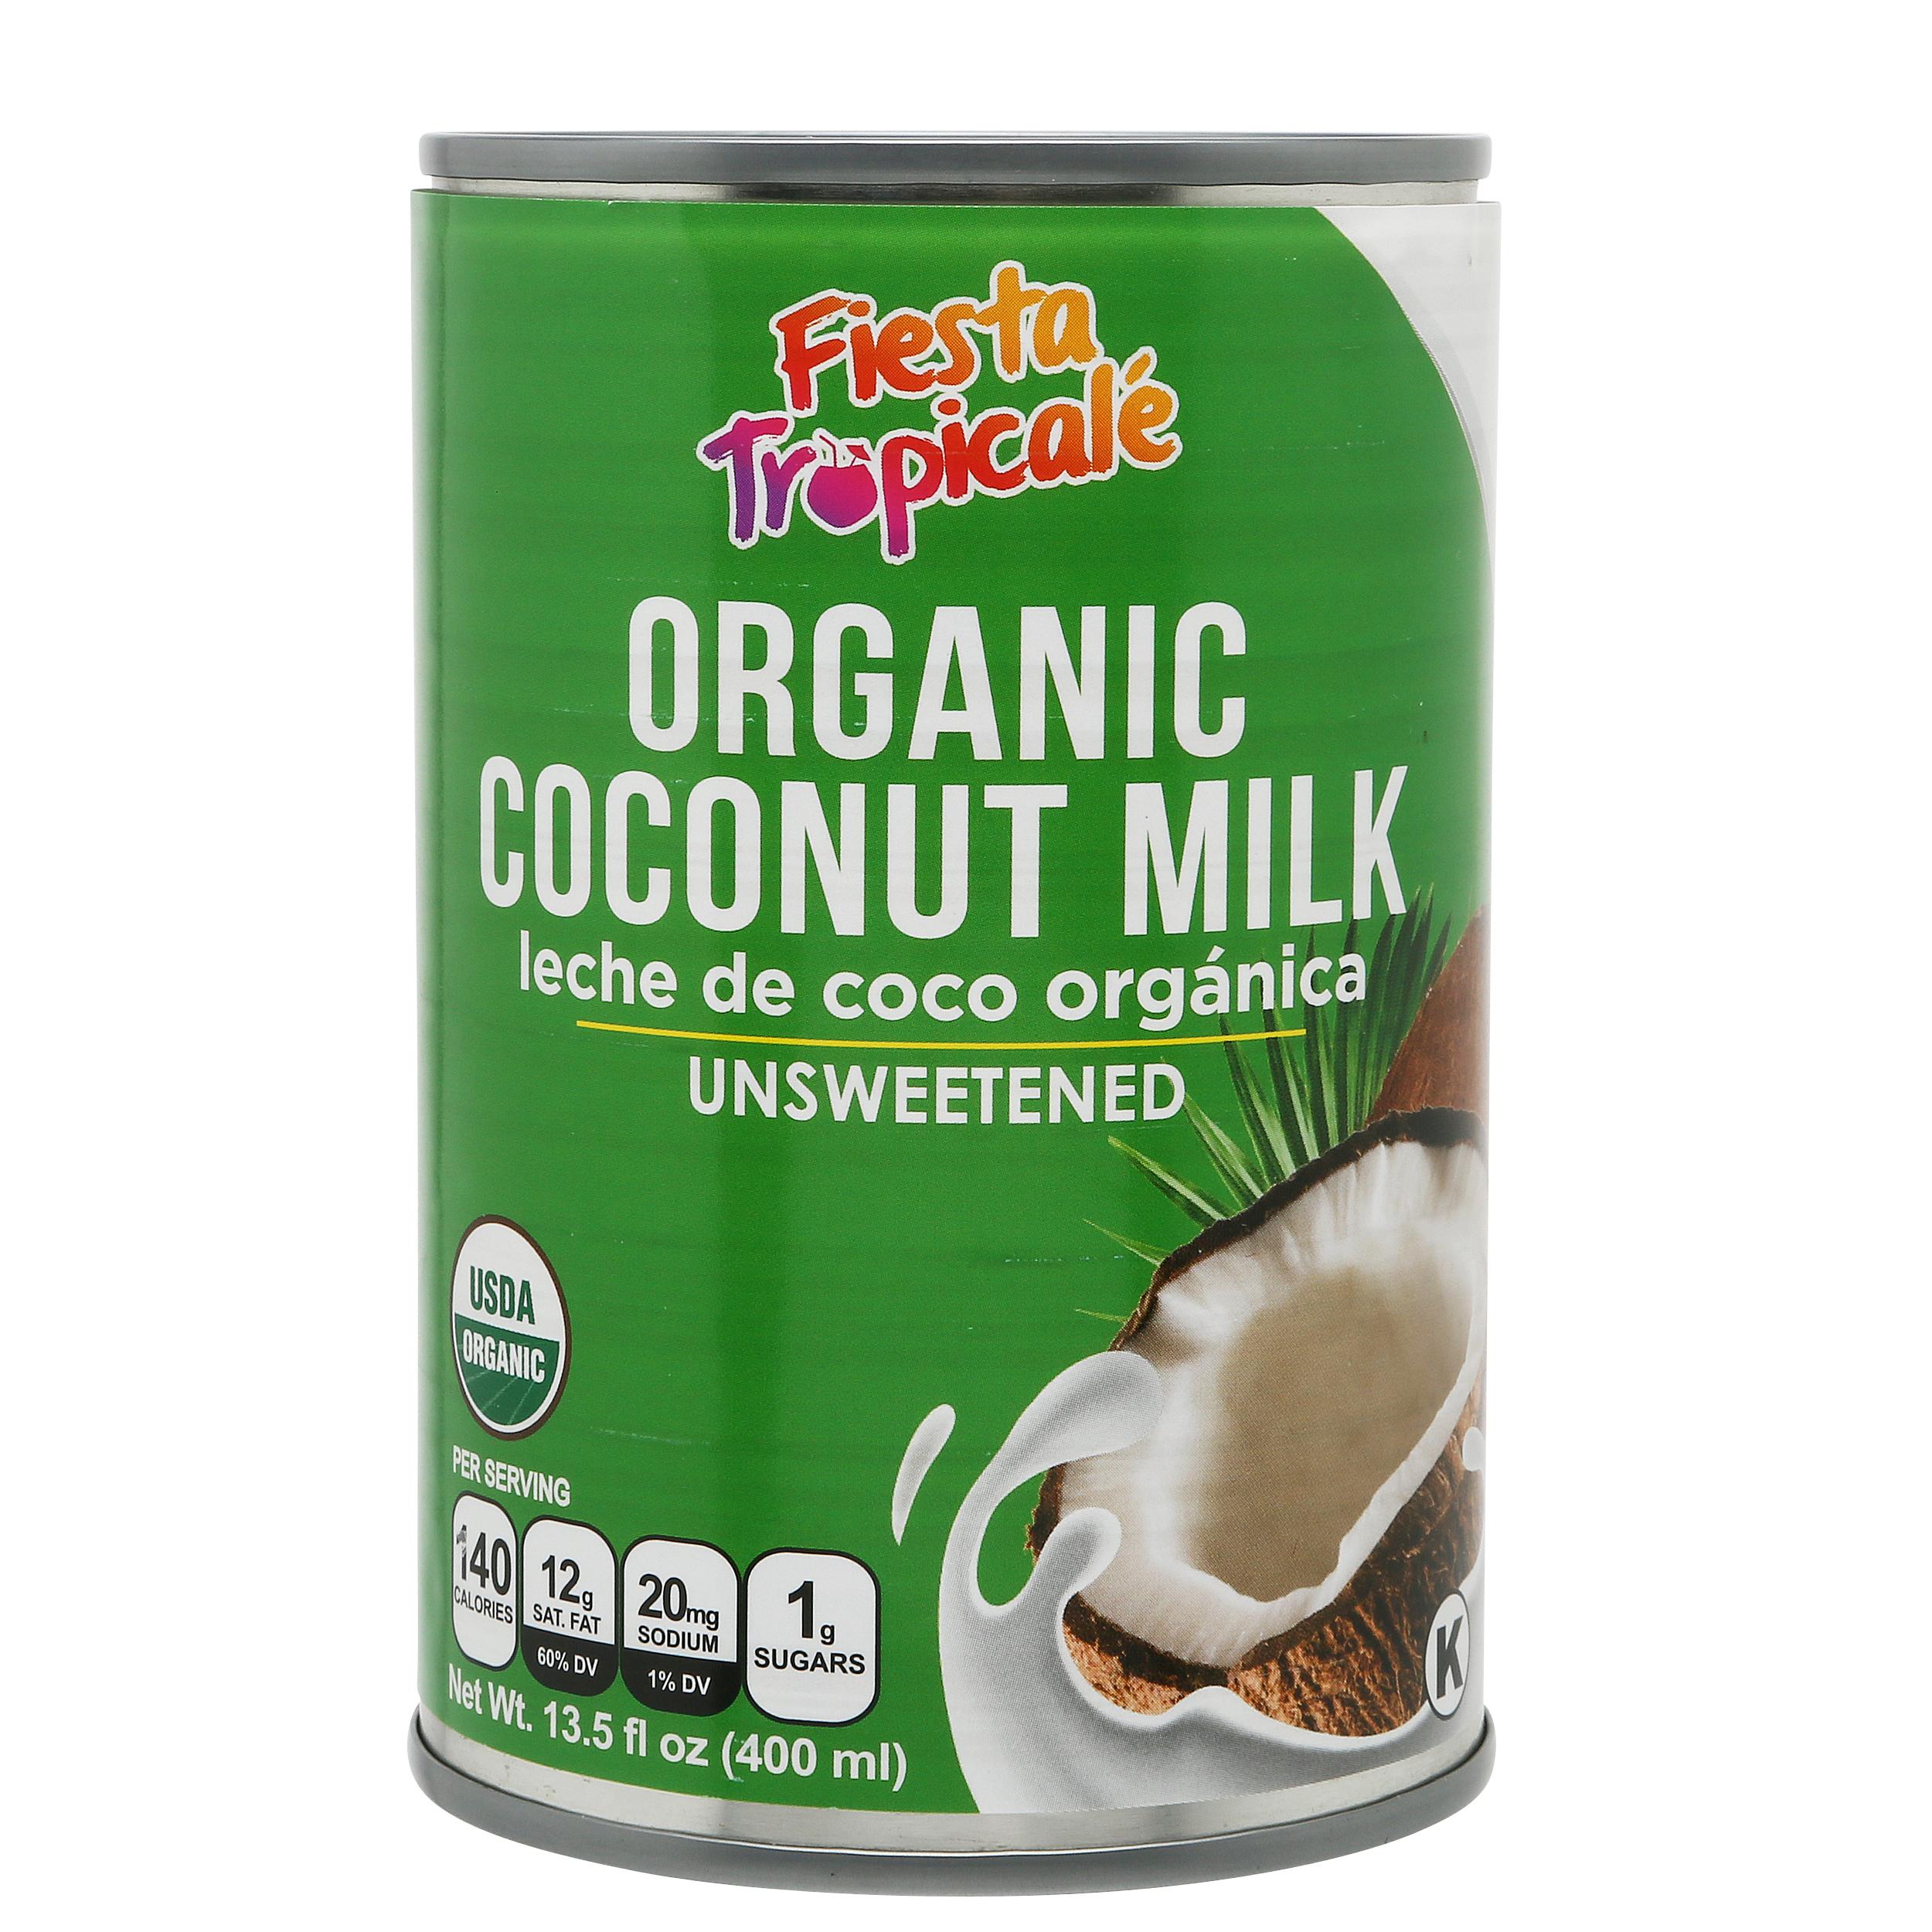 Fiesta Tropicale Organic Coconut Milk